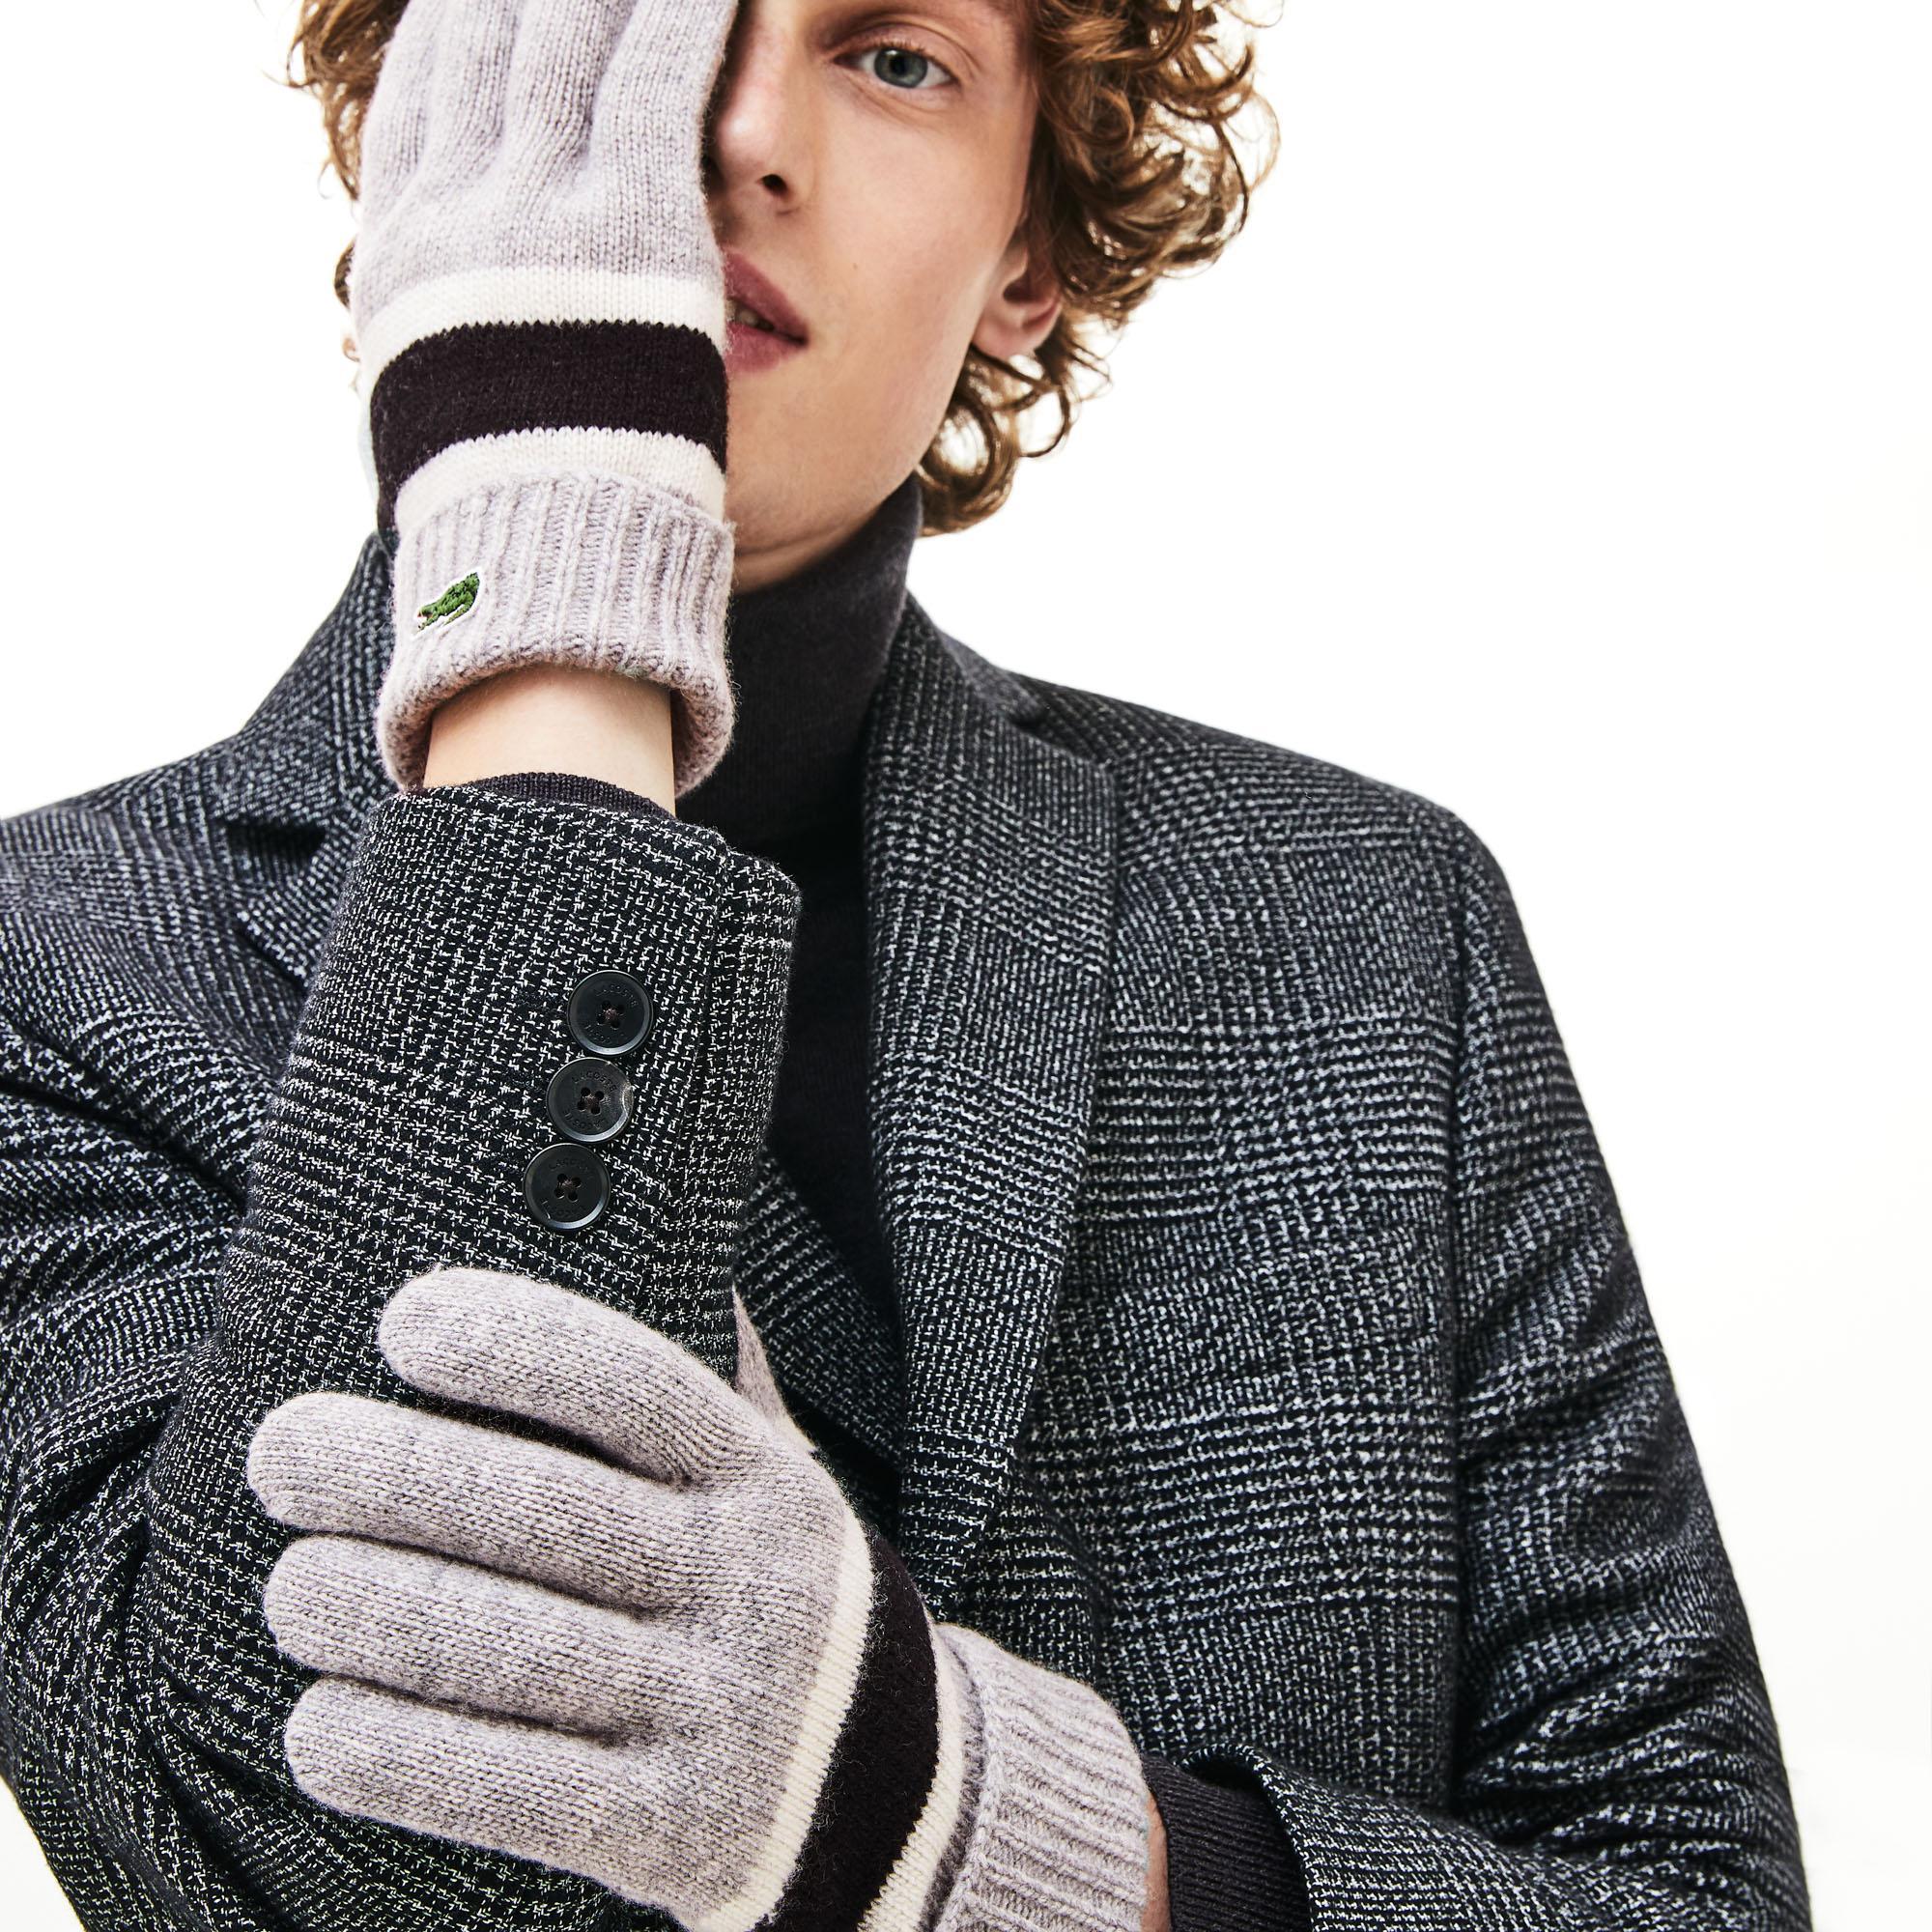 Lacoste рукавички чоловічі